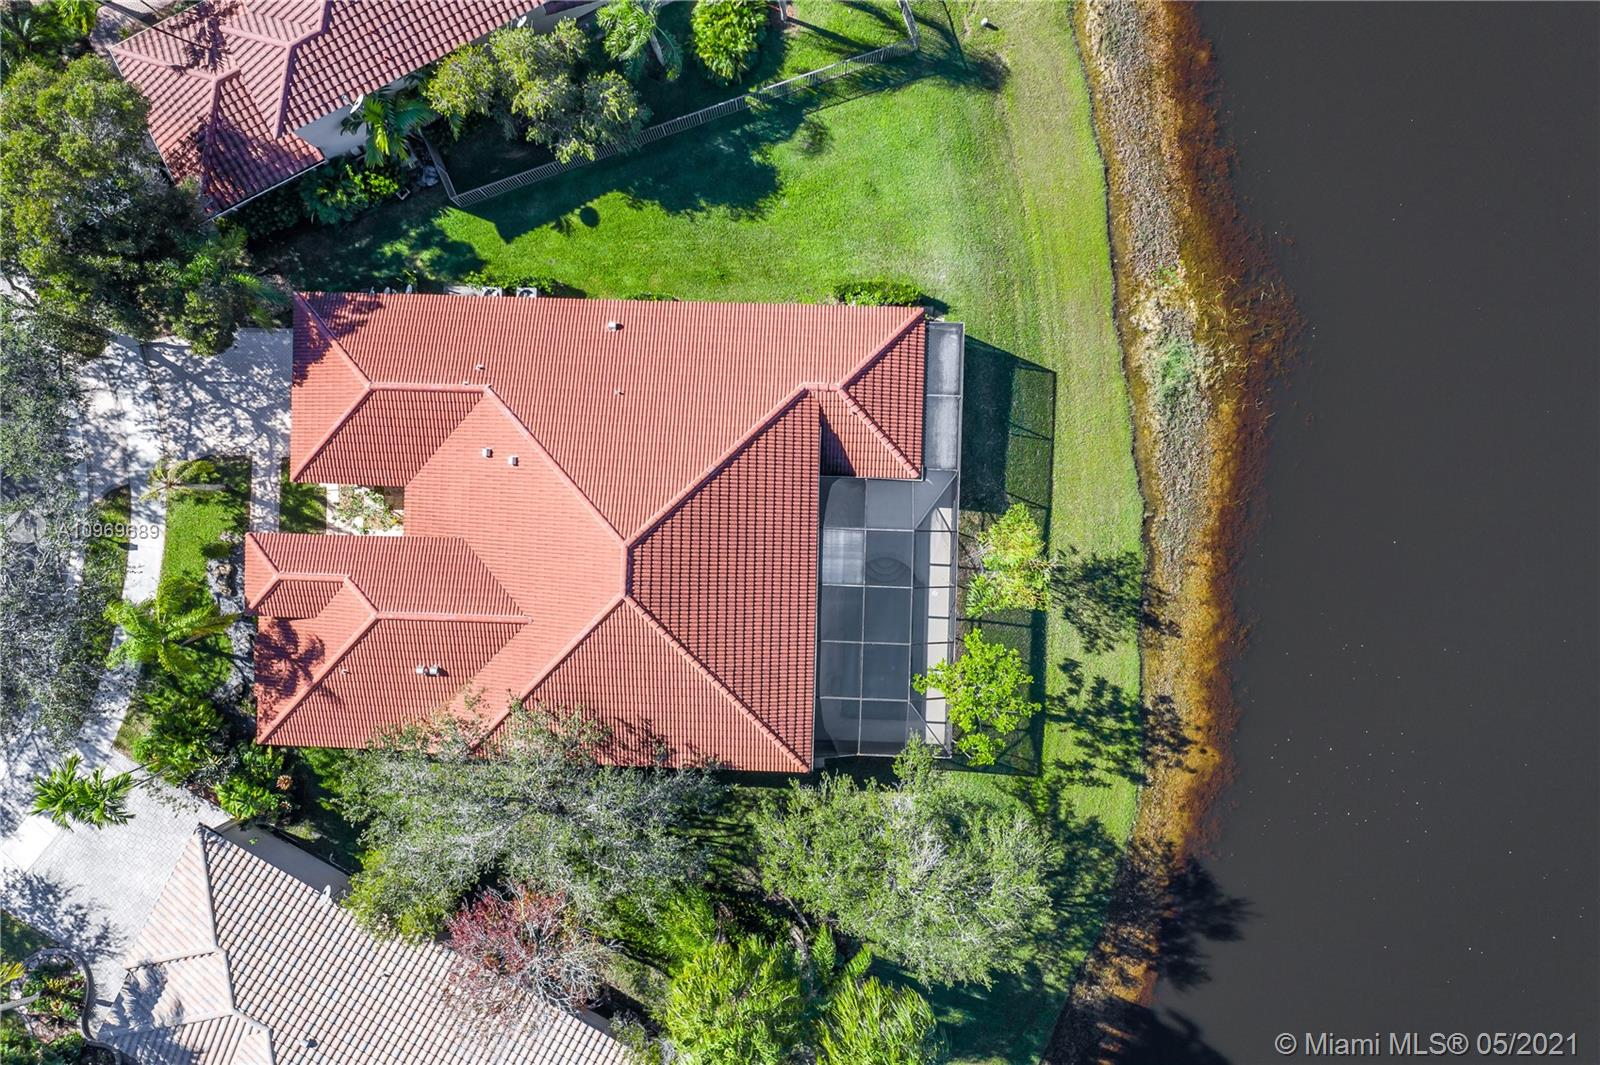 Weston Hills - 2743 Oakbrook Dr, Weston, FL 33332